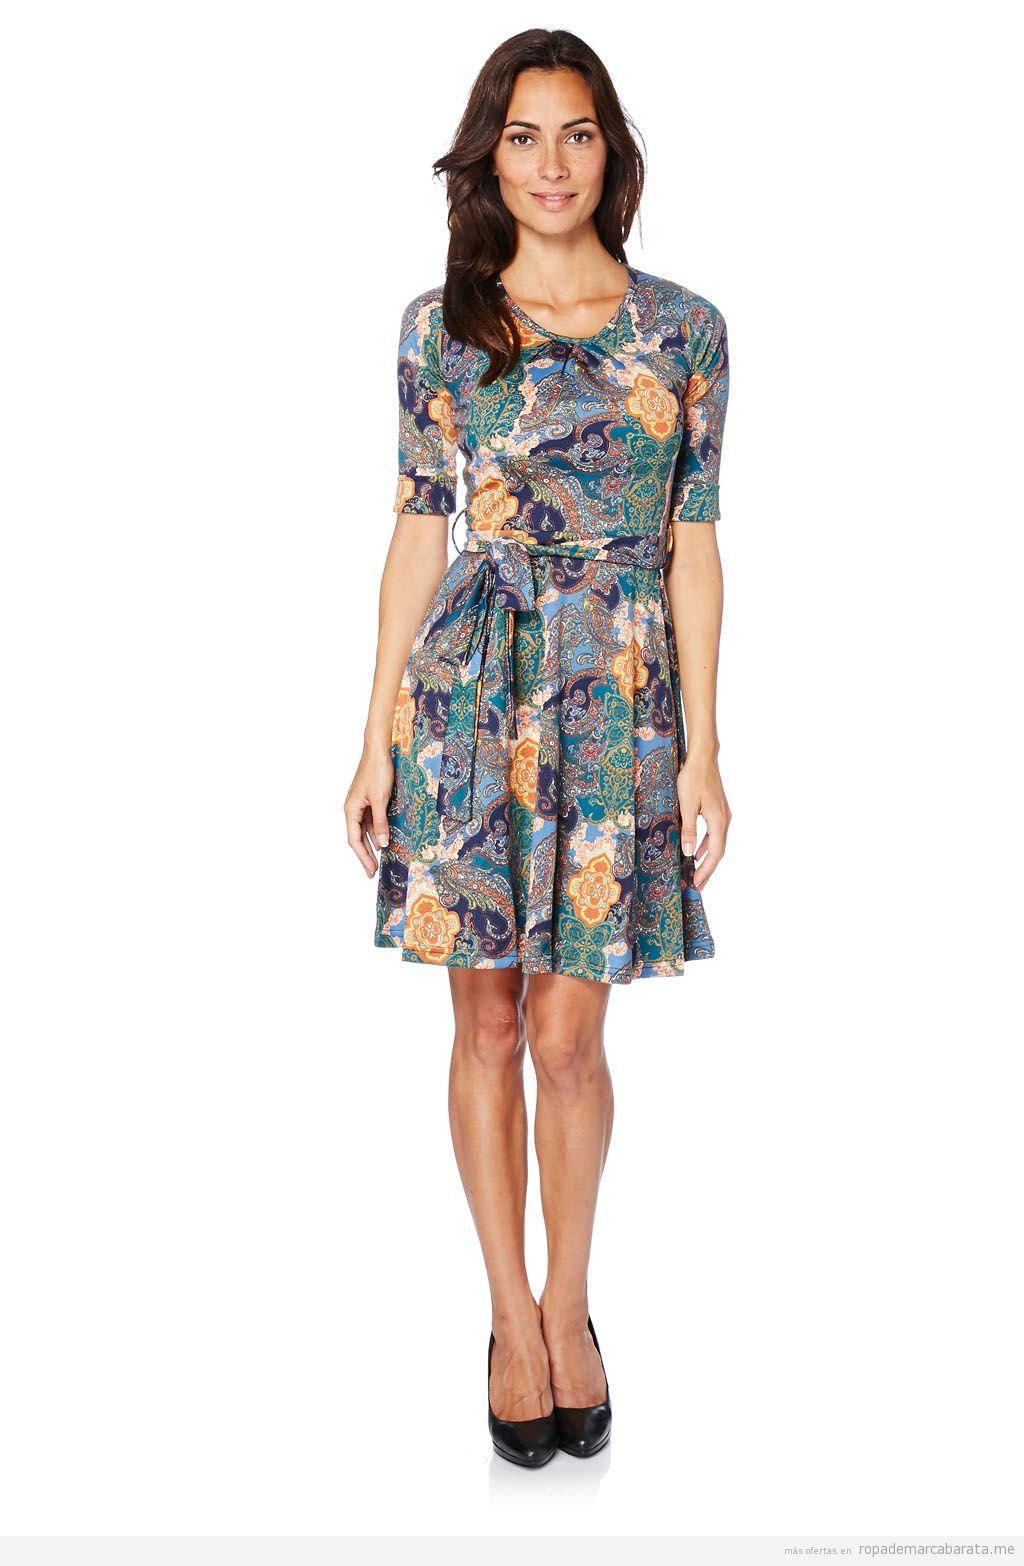 Vestidos estampados marca Supertition baratos, outlet online 3